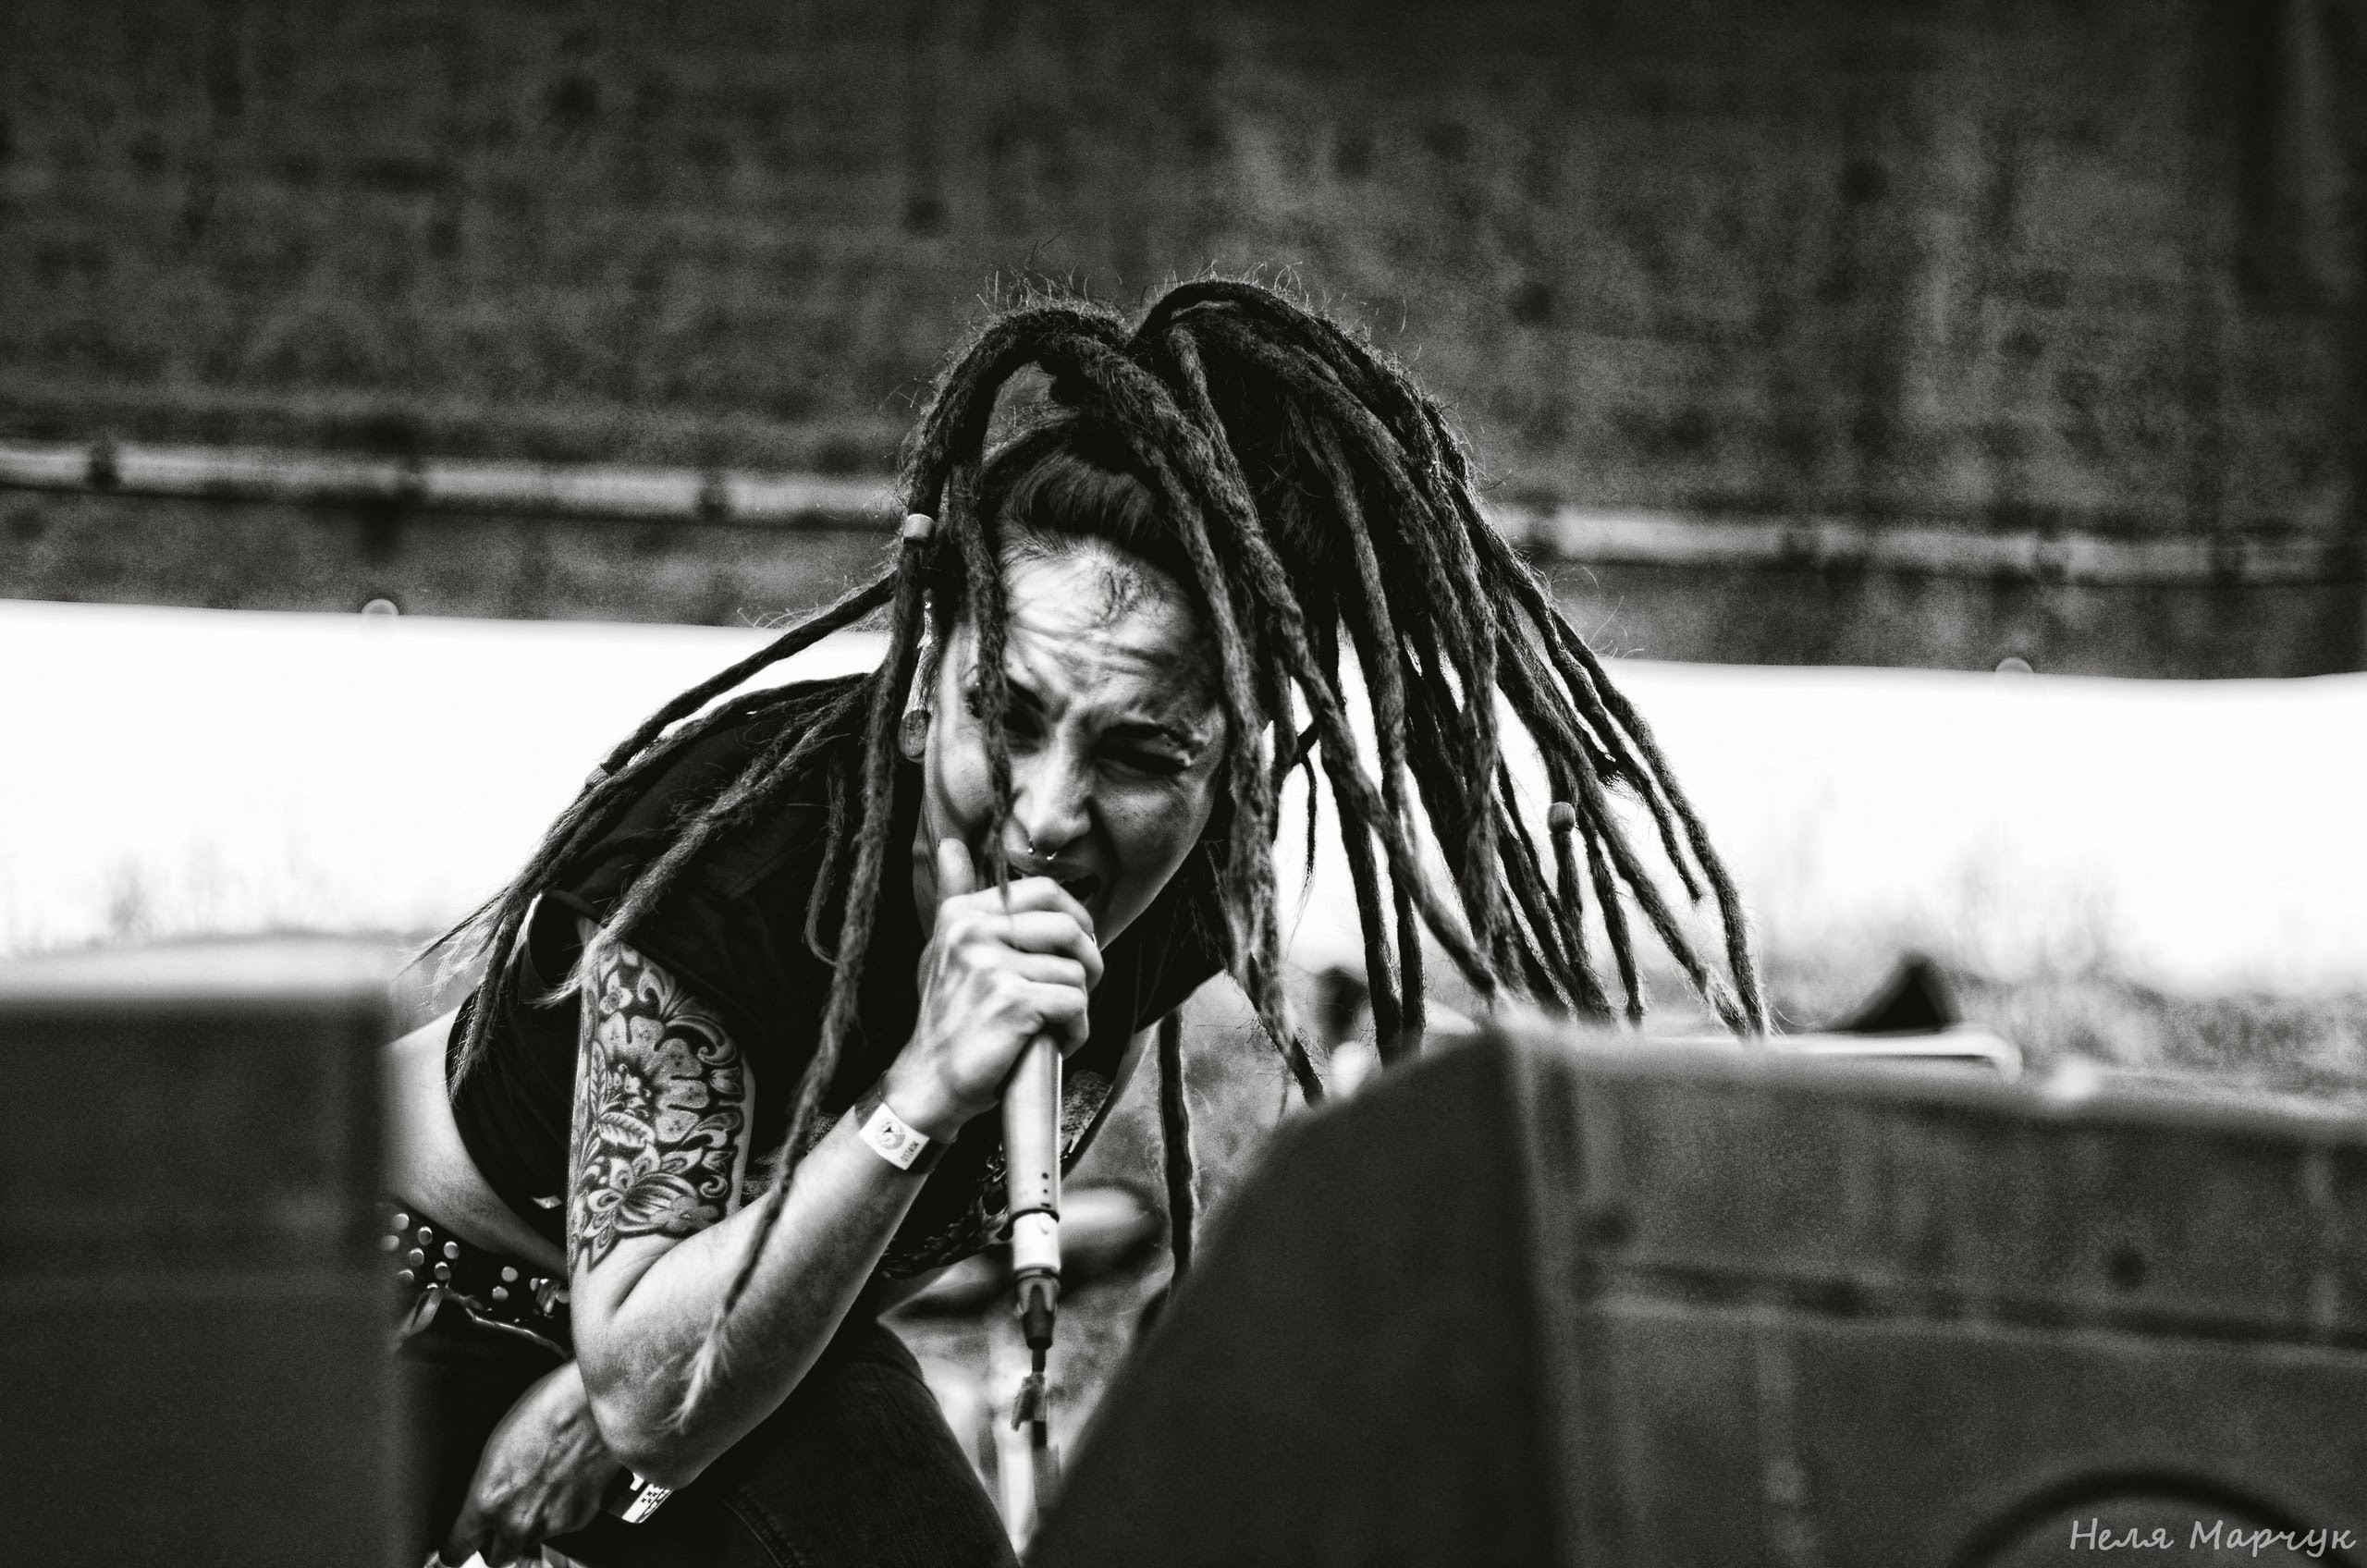 Jinjer Tatyana Shmayluk Metal Music Metal Band Dreadlocks Singing Screaming Women Face Monochrome Pi 2560x1696